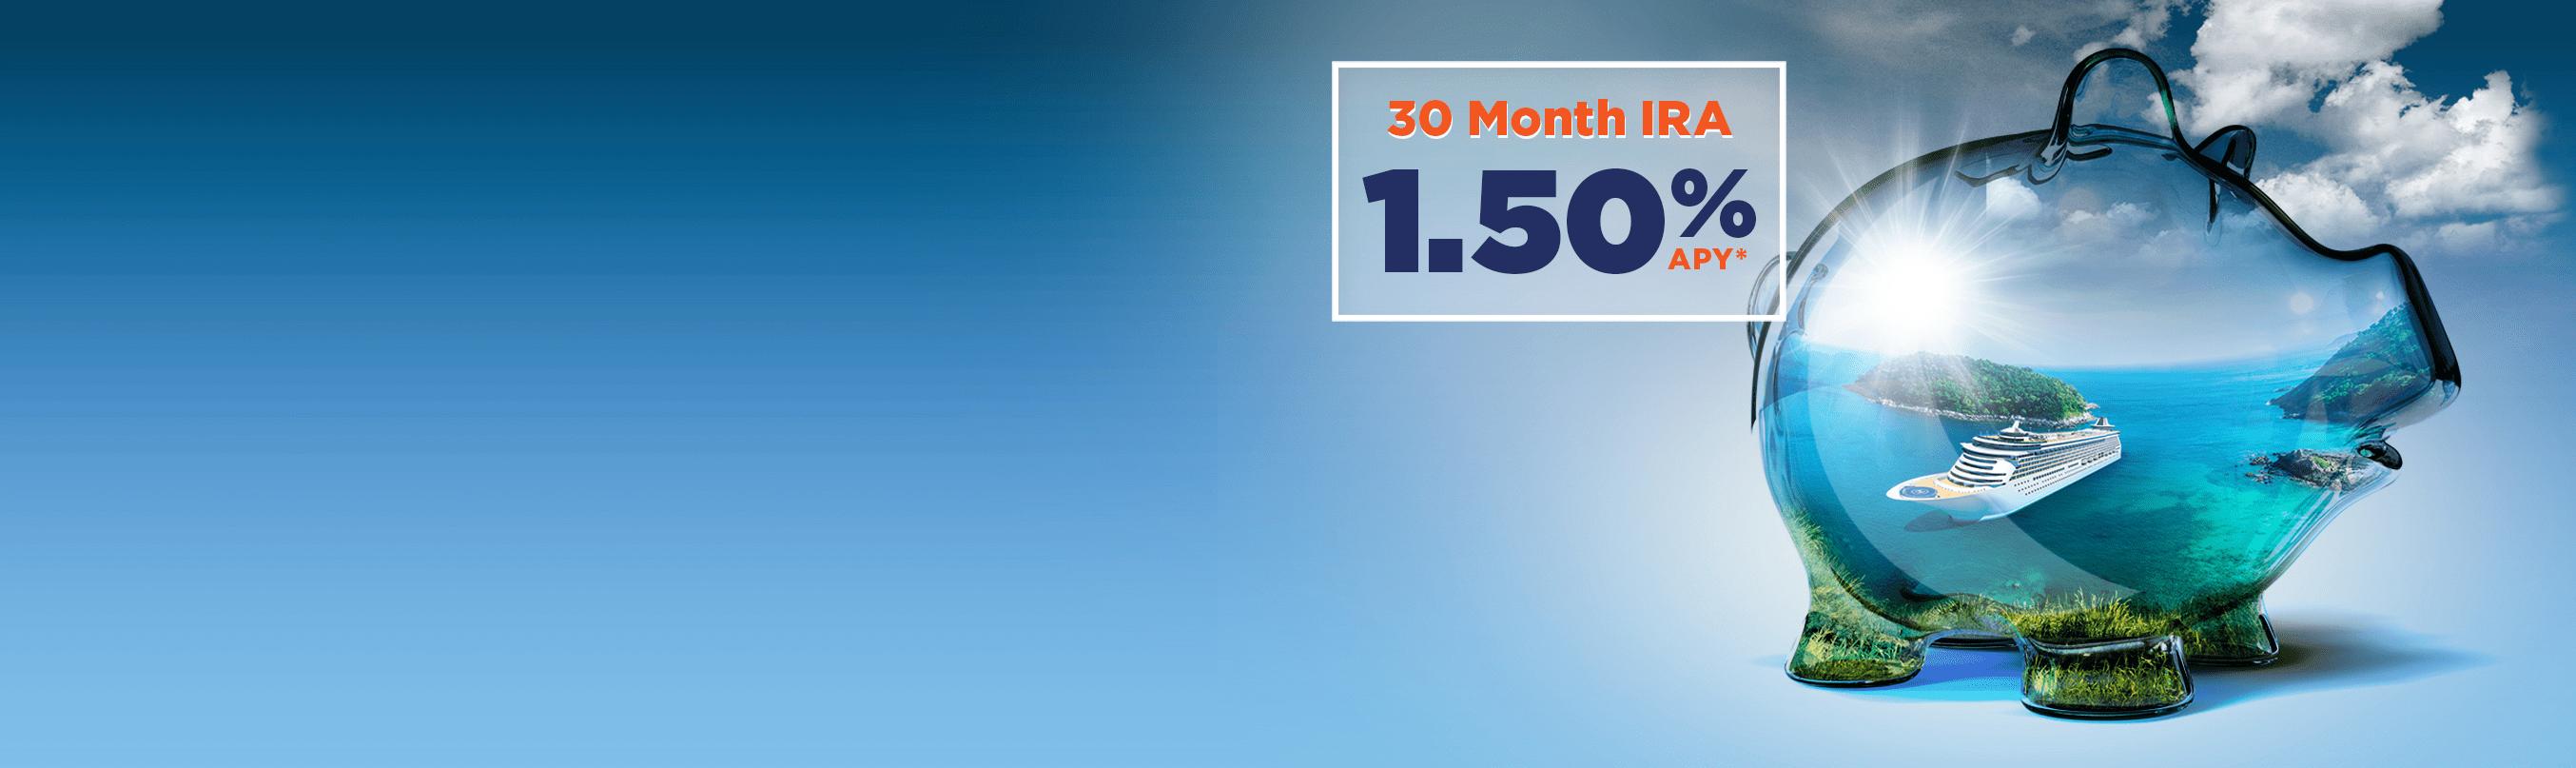 30 Month IRA